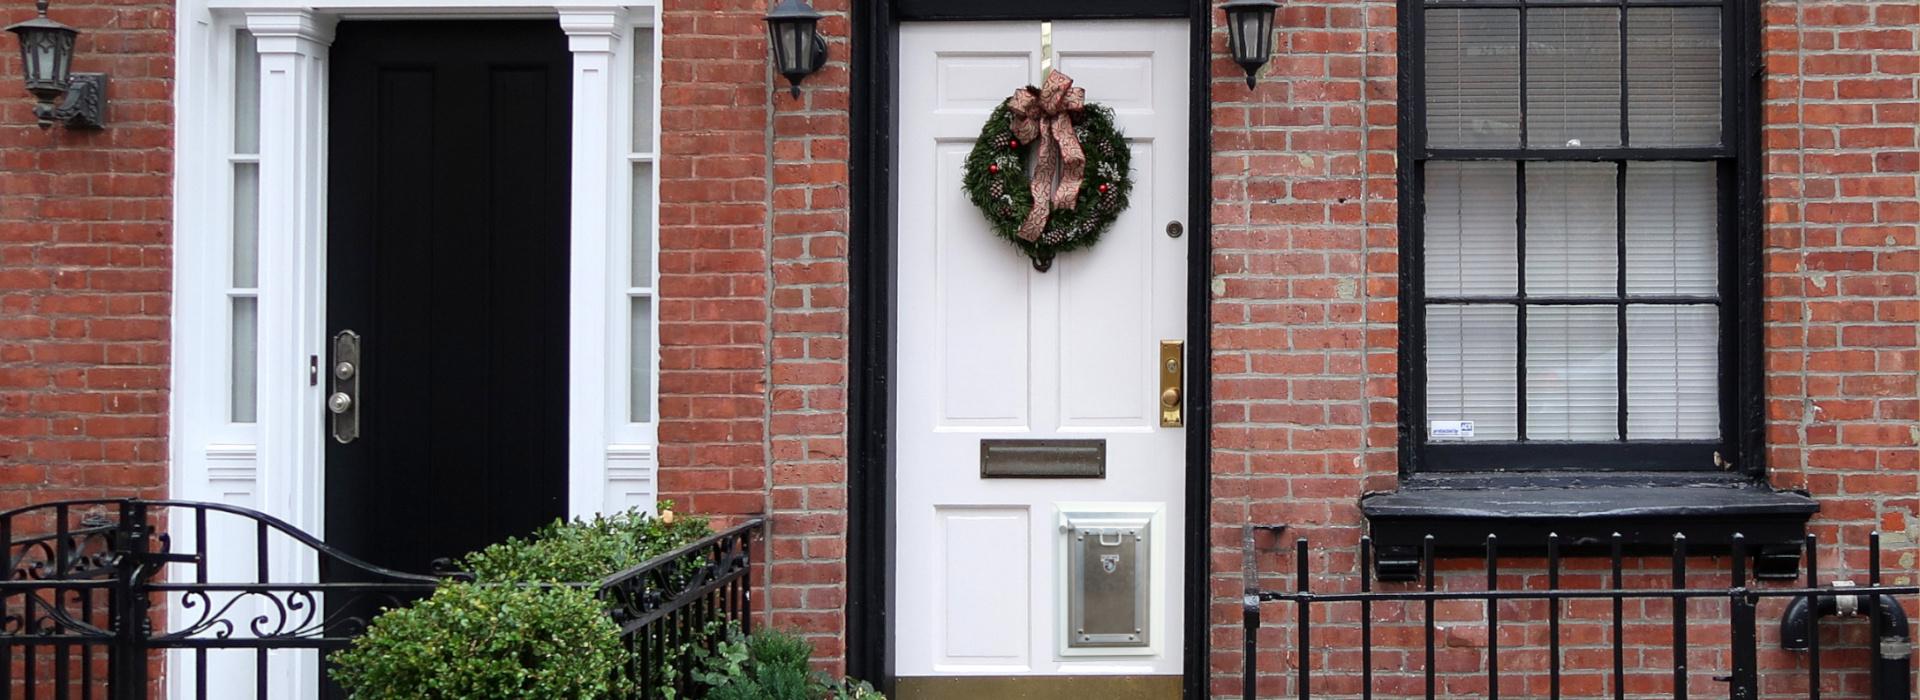 two-doors-with-wreathslide.jpg